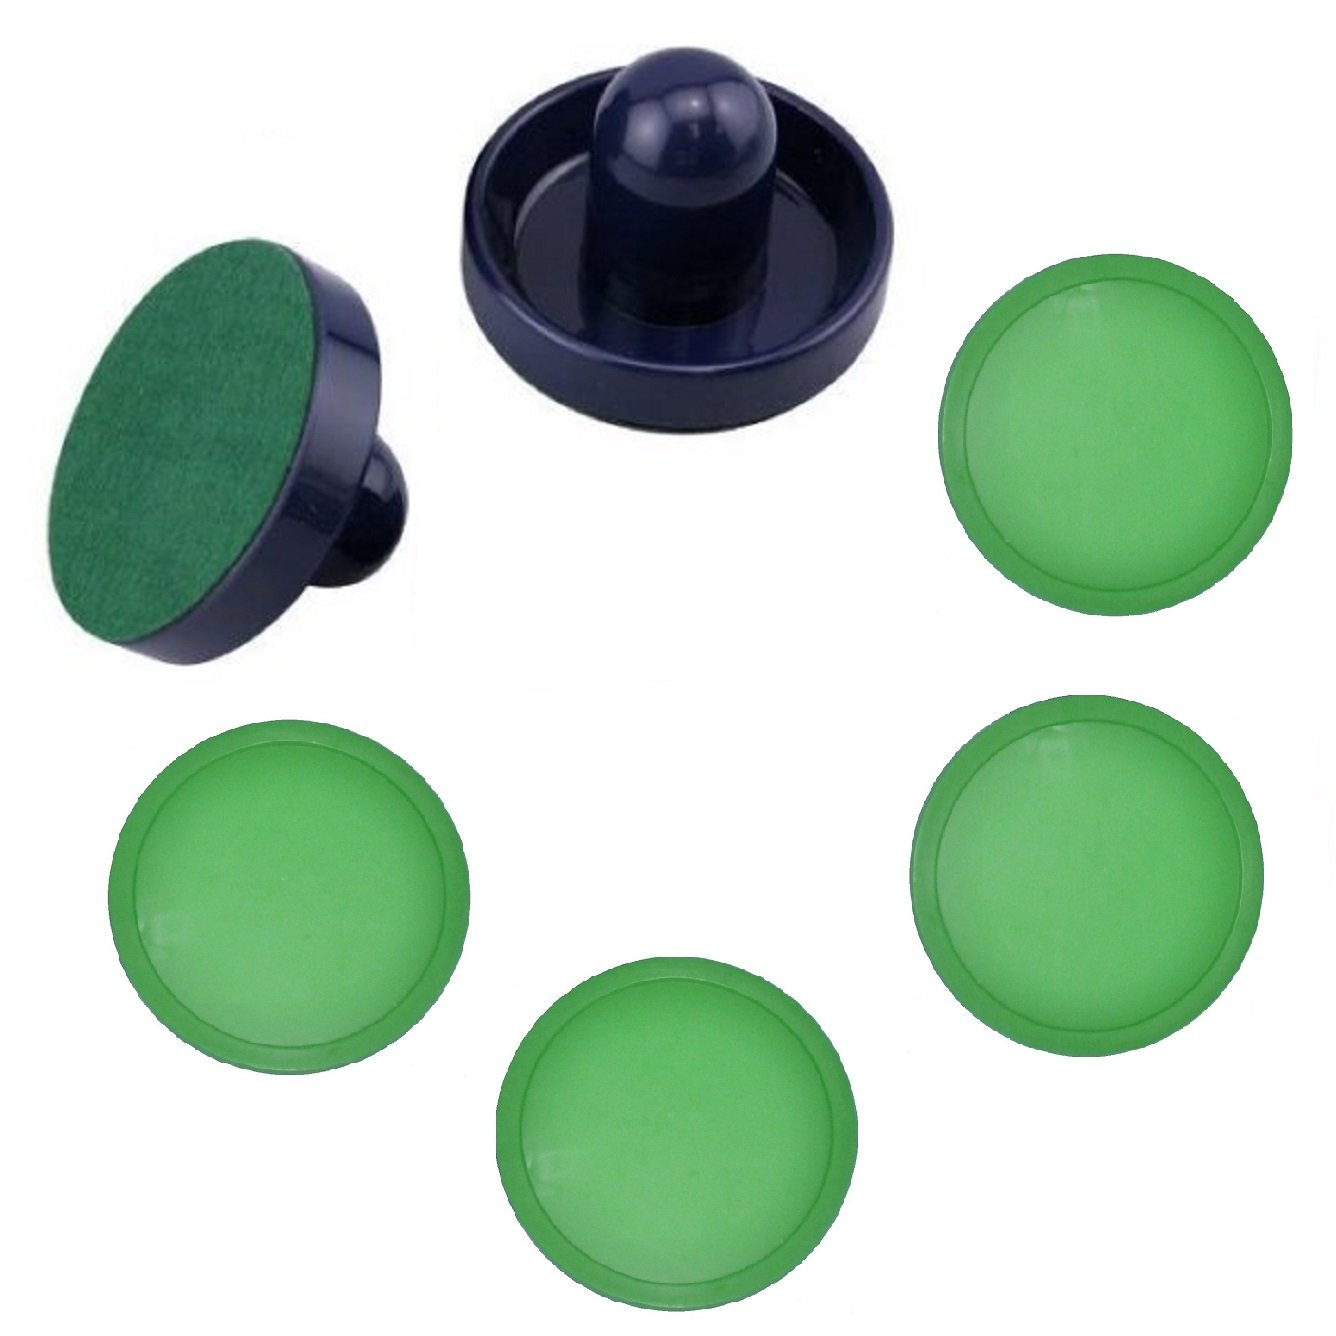 2 Blue Table Hockey Mallets + 4 Lg Green Air Pucks by PRC